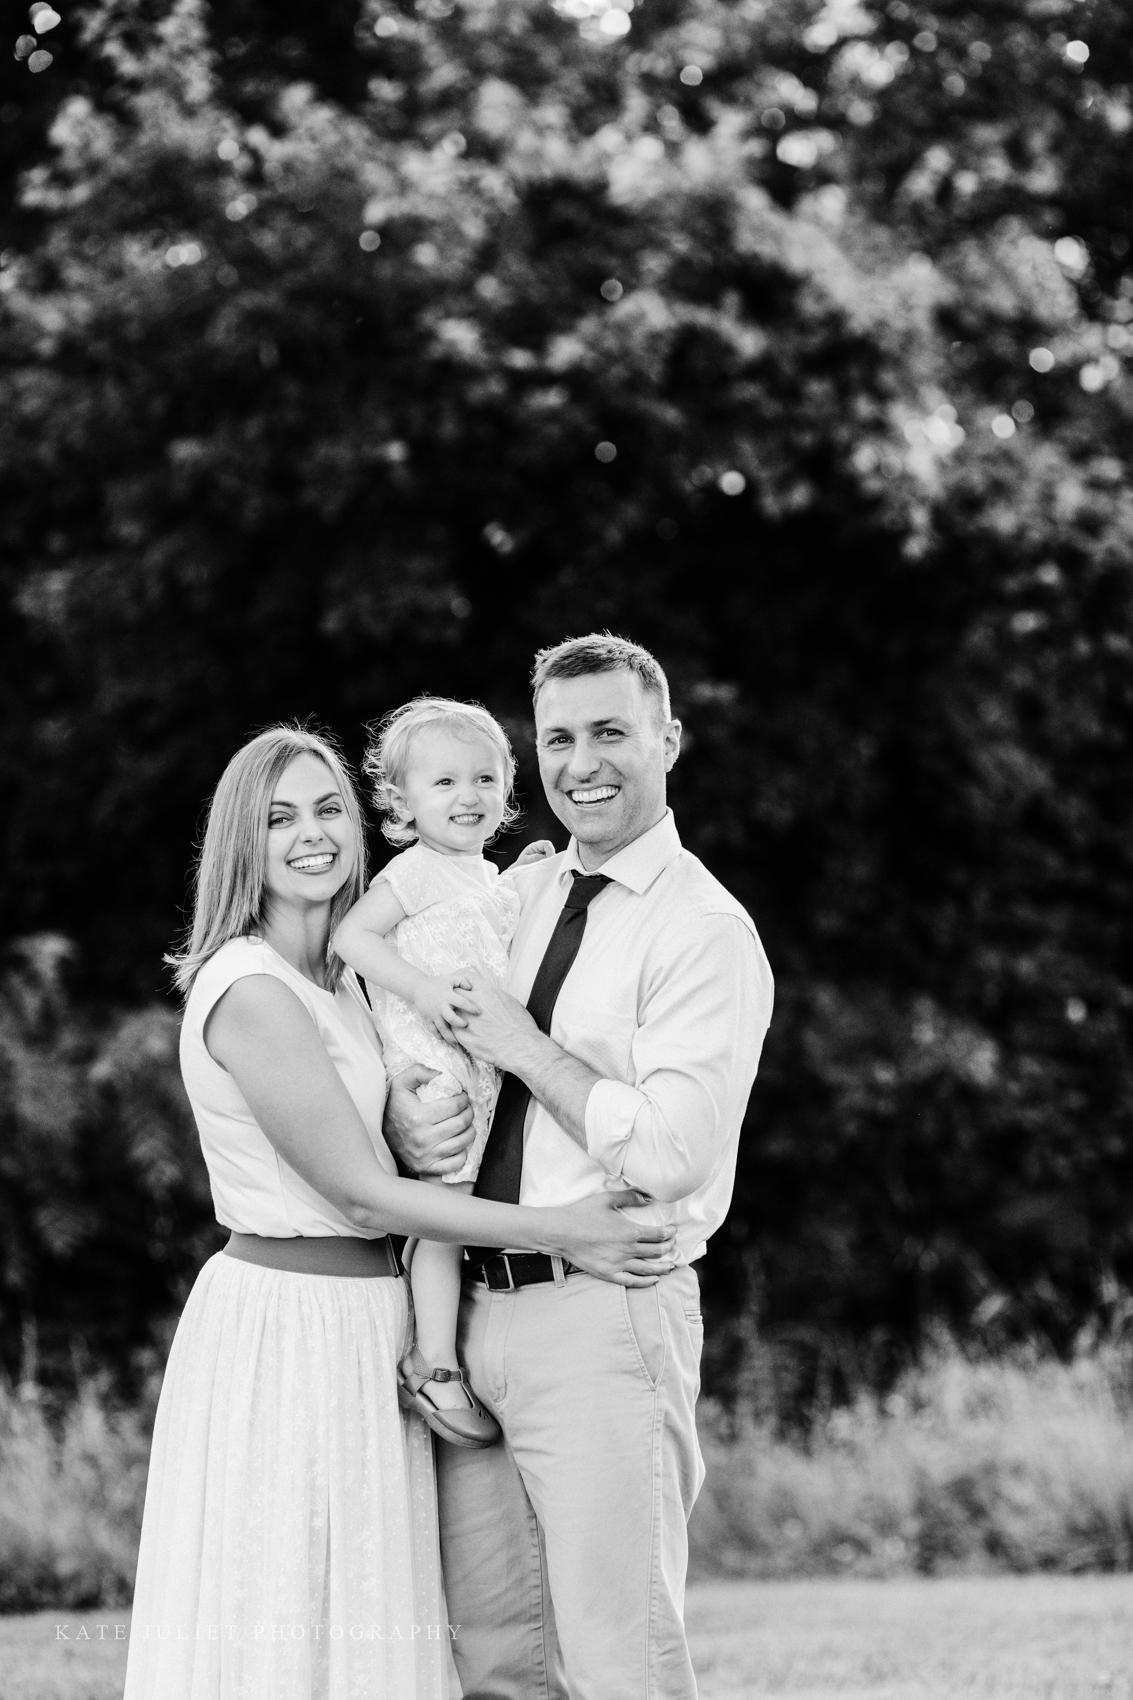 kate_juliet_photography-family-web-4.jpg